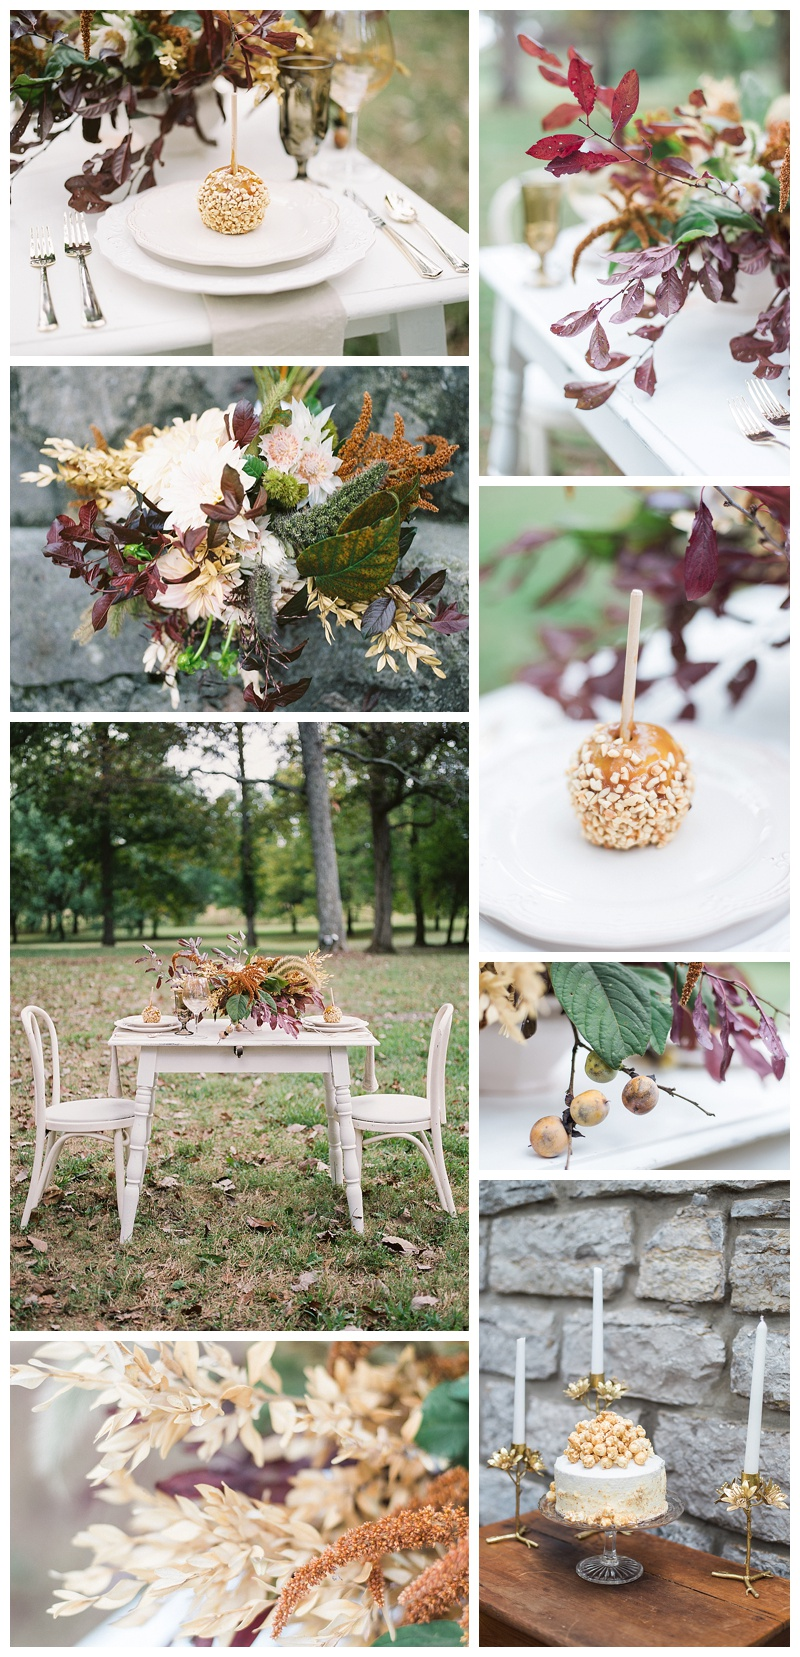 Fall-themed Wedding Caramel apples and Caramel popcorn cake